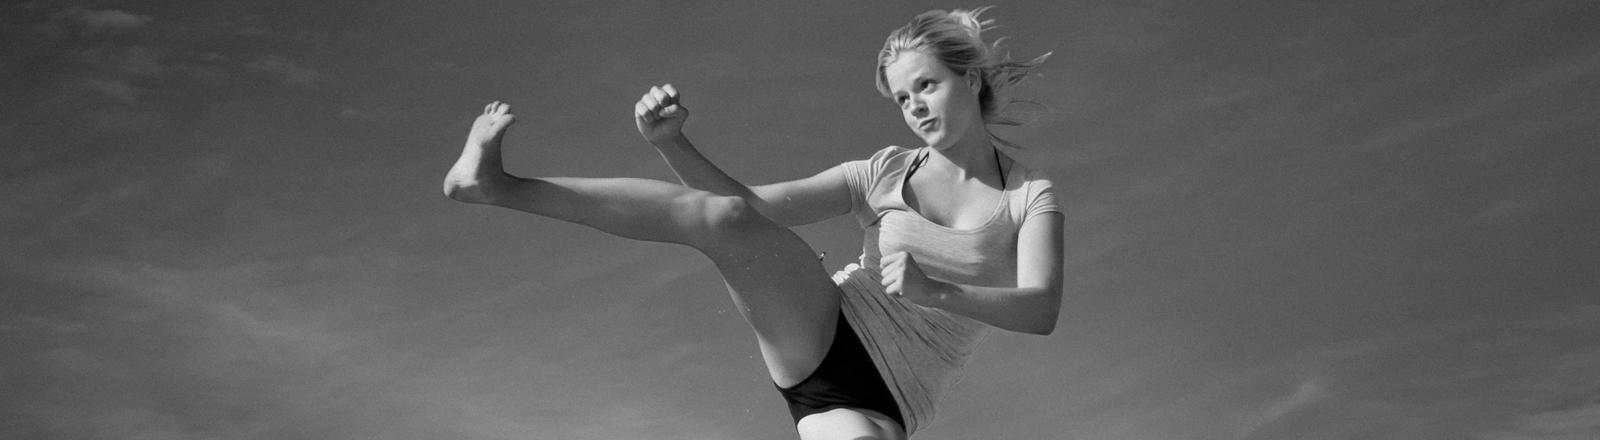 Frau macht Kampfsport.